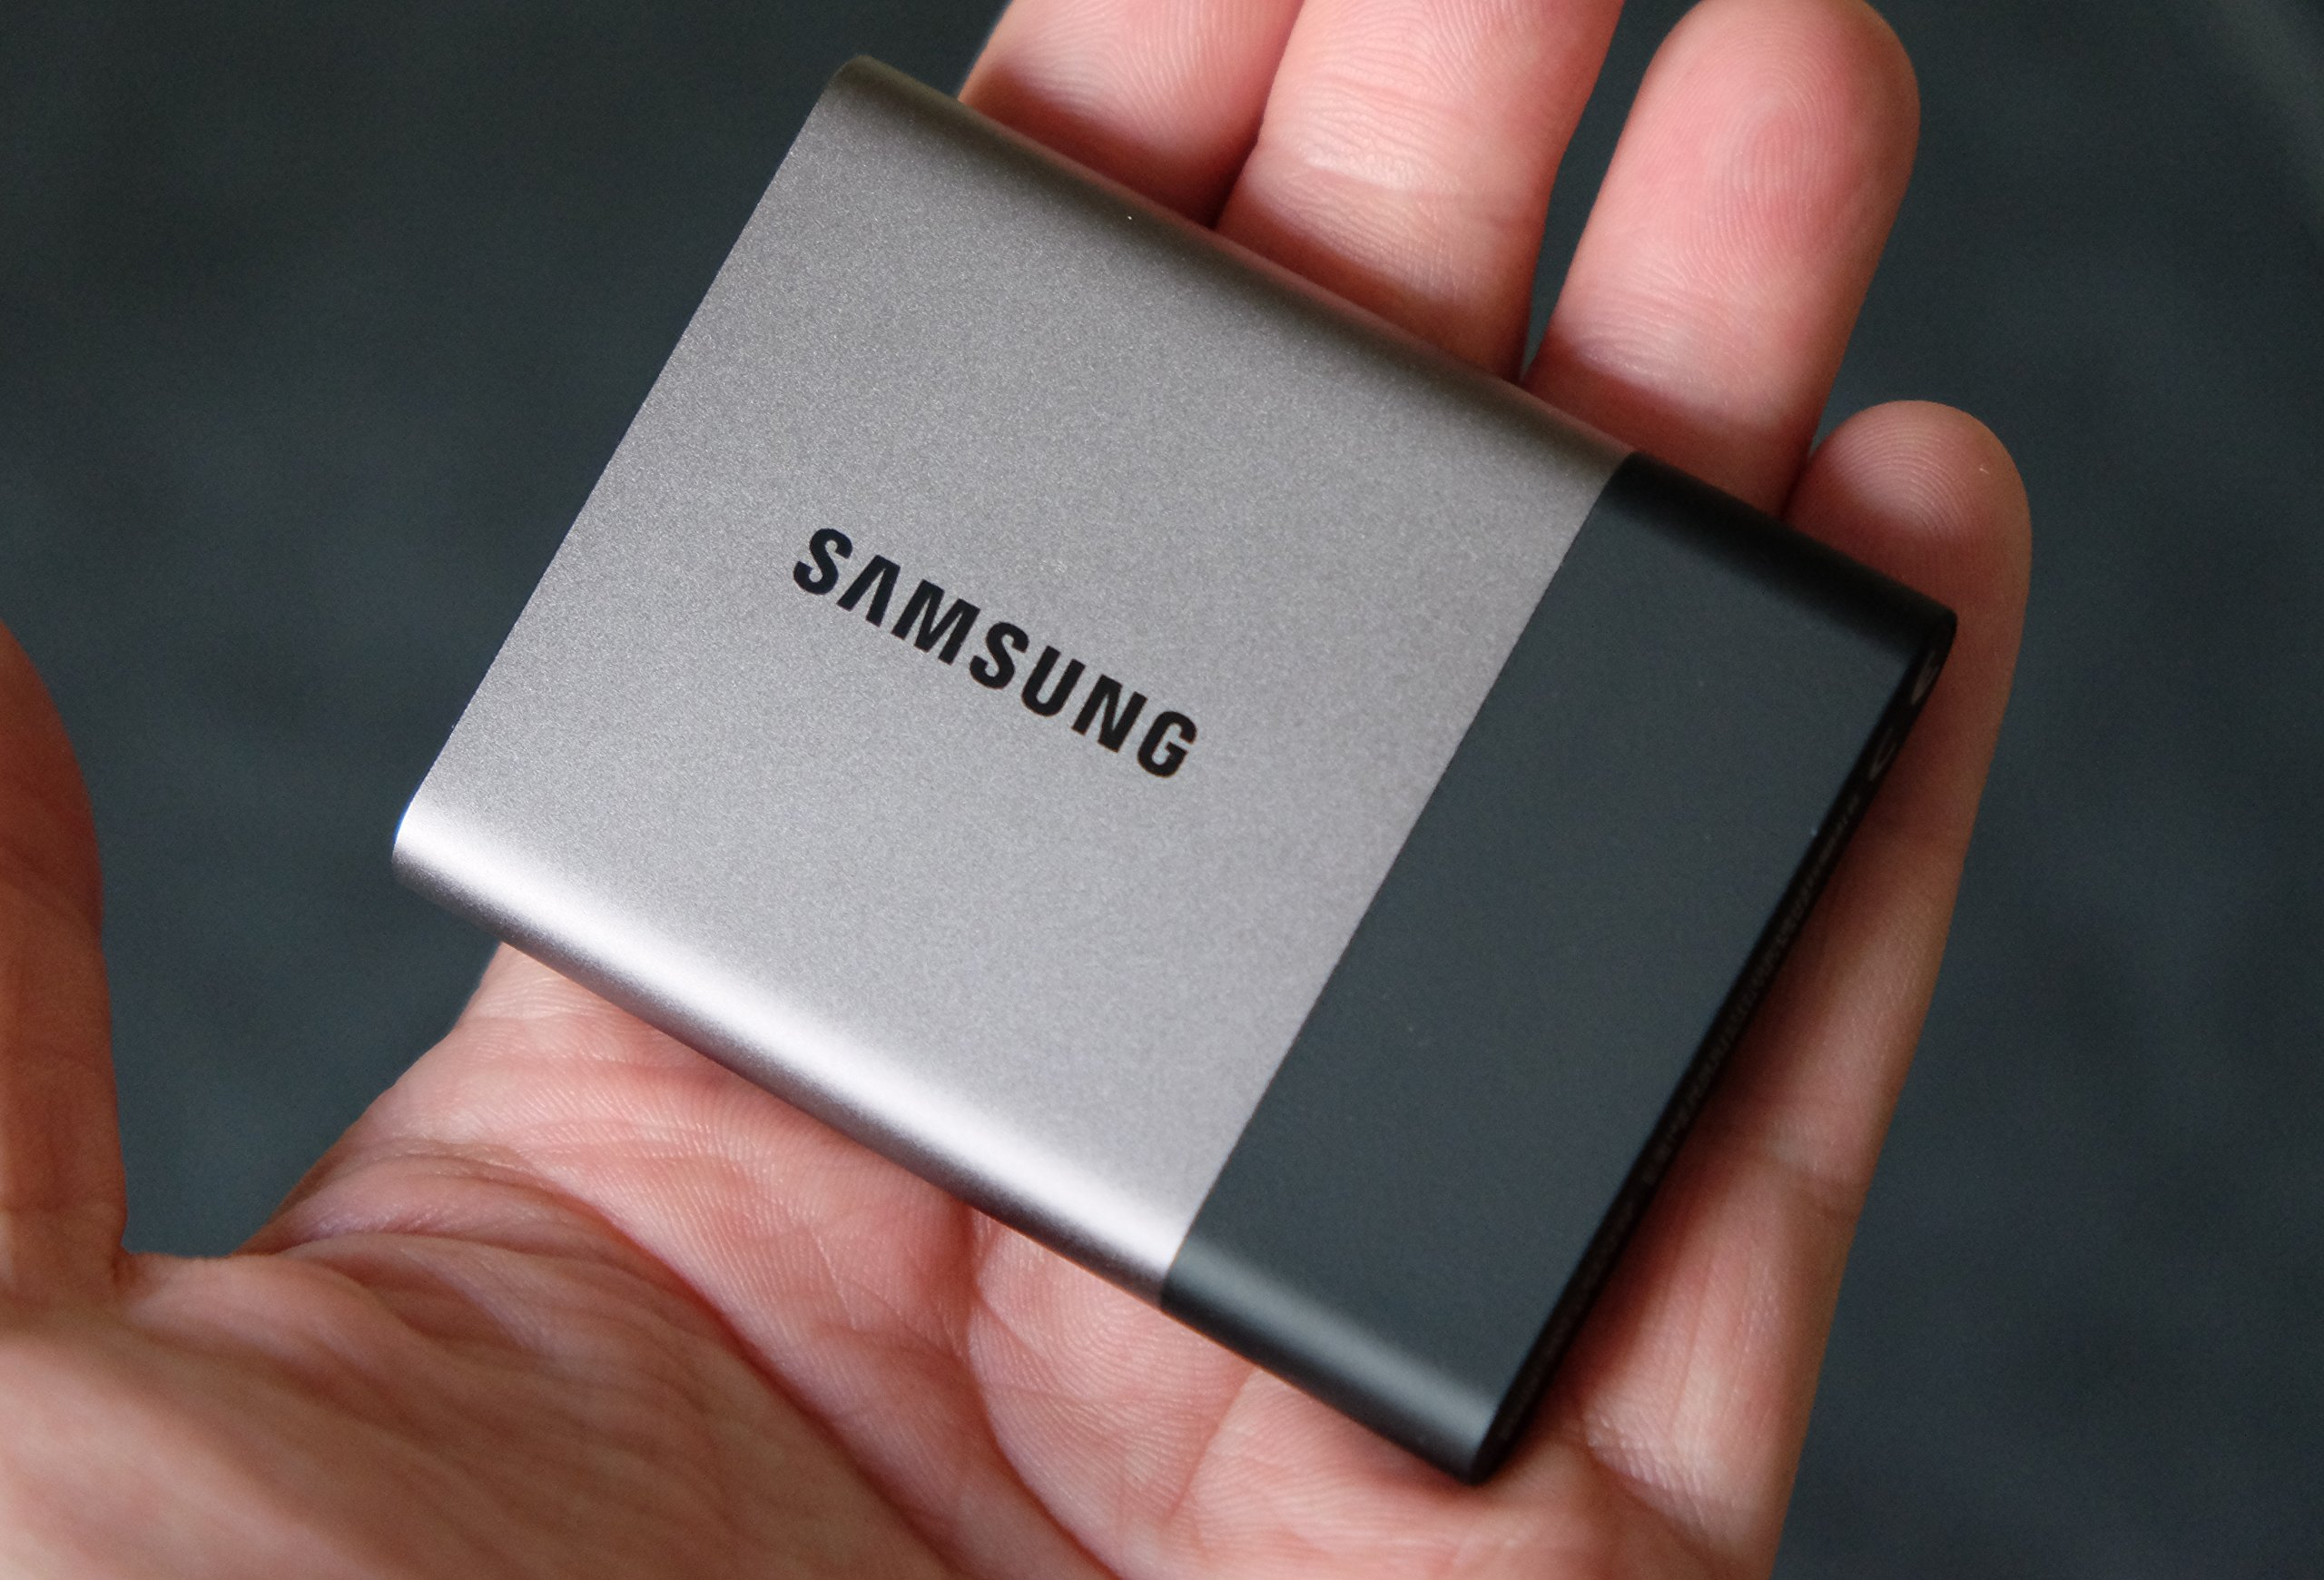 Samsung T3 Portable SSD - 250GB - USB 3.1 External SSD (MU-PT250B/AM) (Renewed) by Samsung (Image #4)